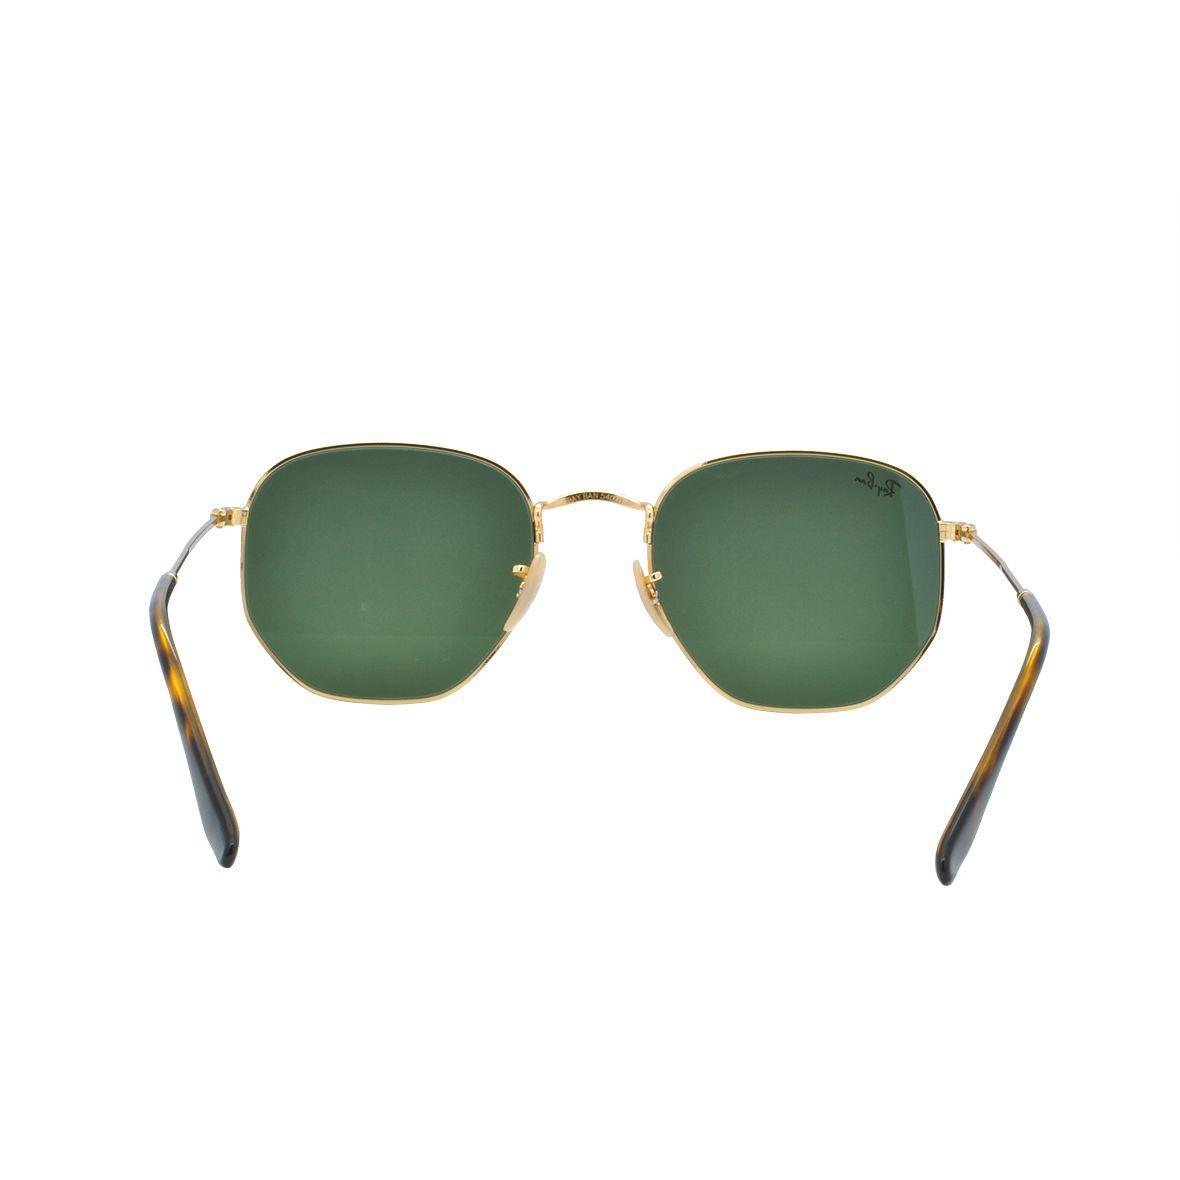 cd6dfc29020fb Óculos de Sol Ray Ban Unissex Hexagonal RB3548N 001 54 - Metal Dourado R   532